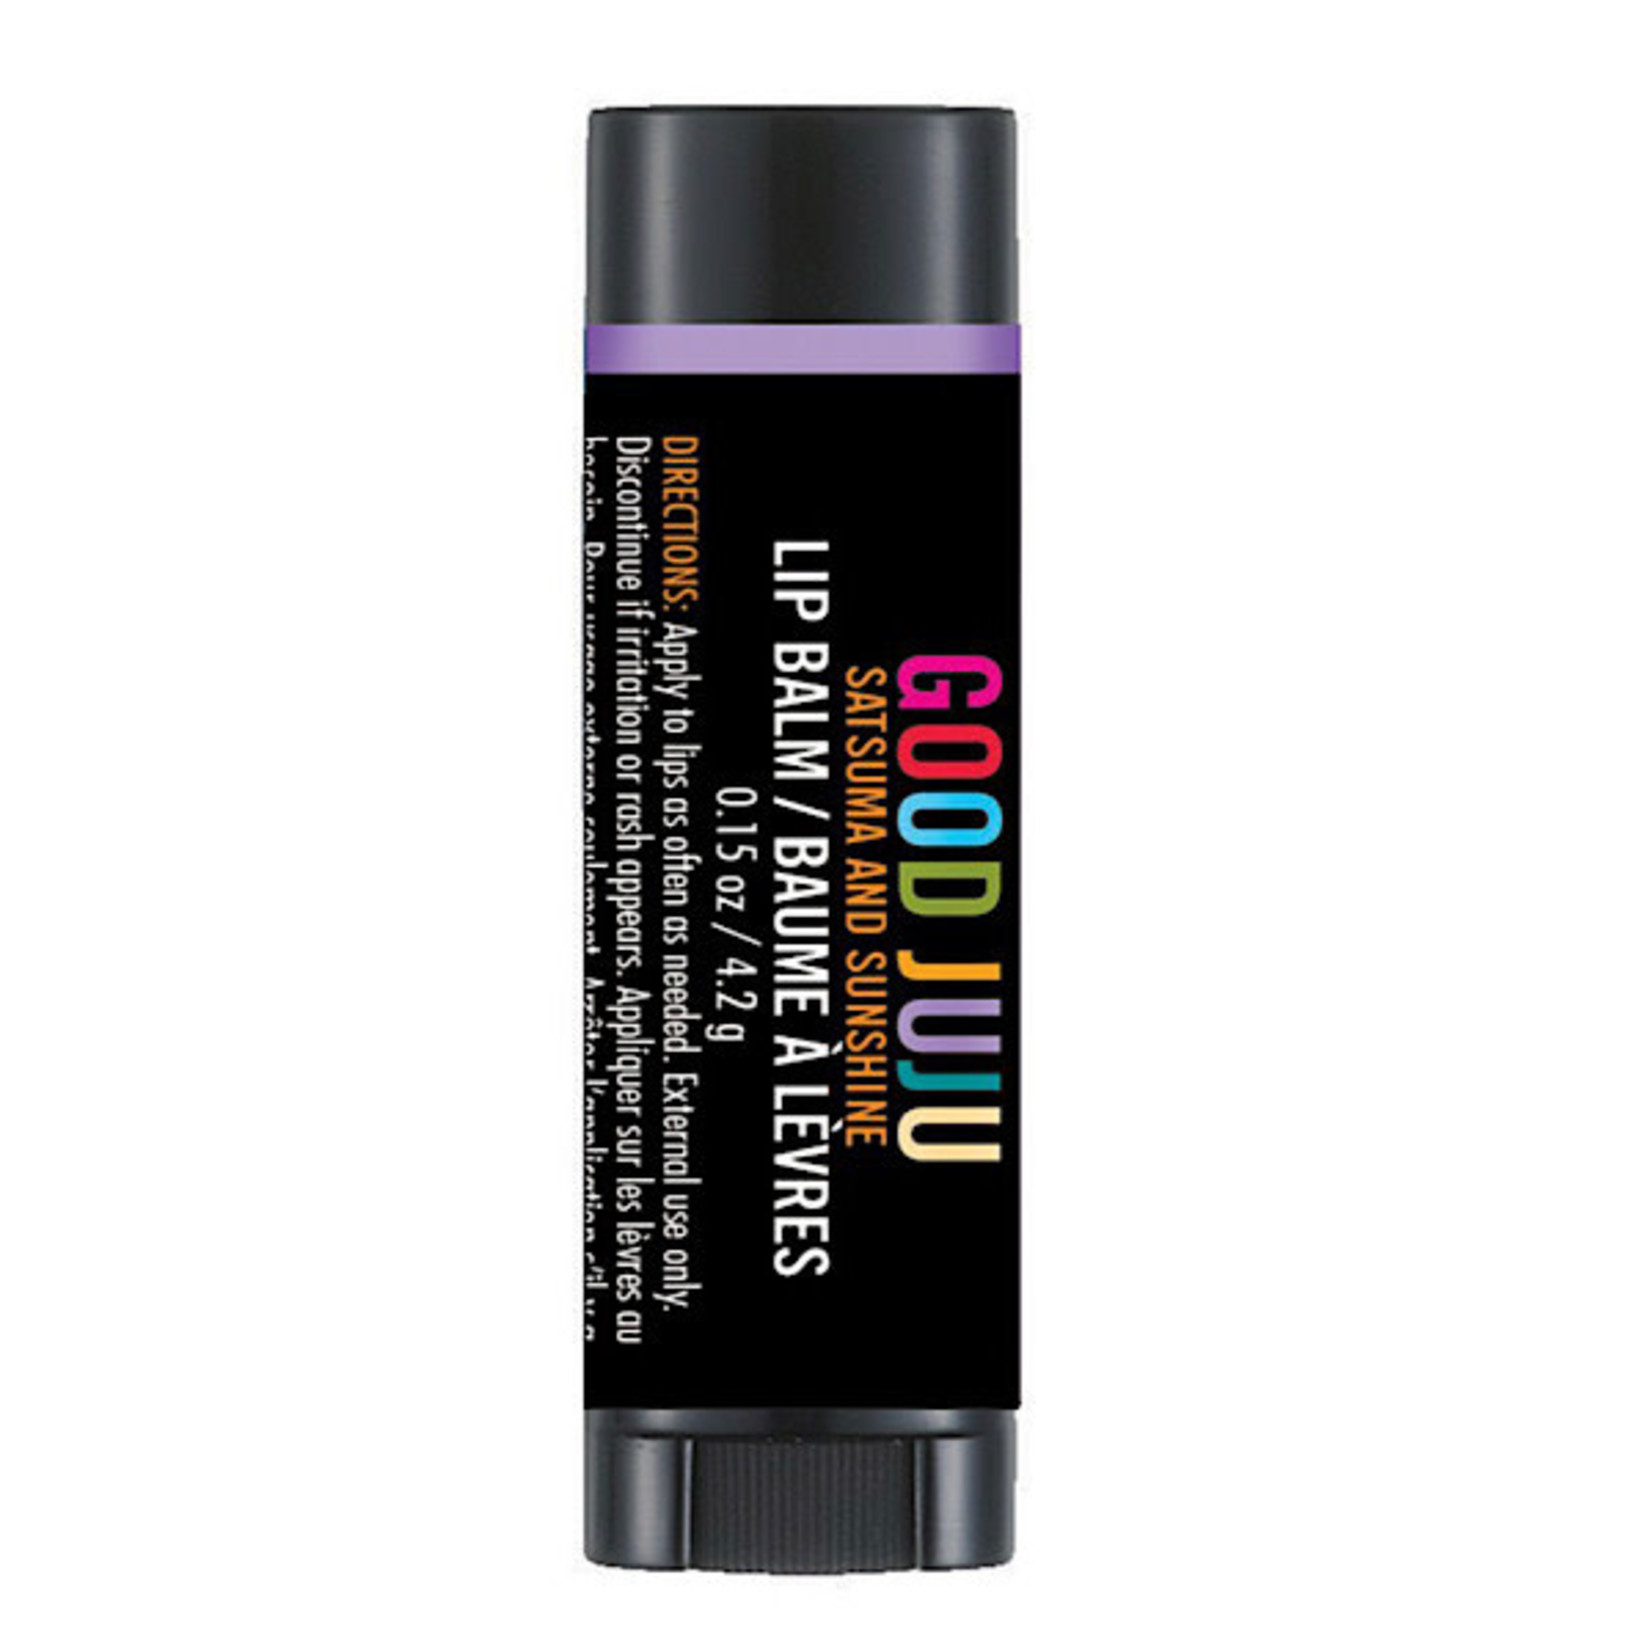 Lip Balm - Good Juju